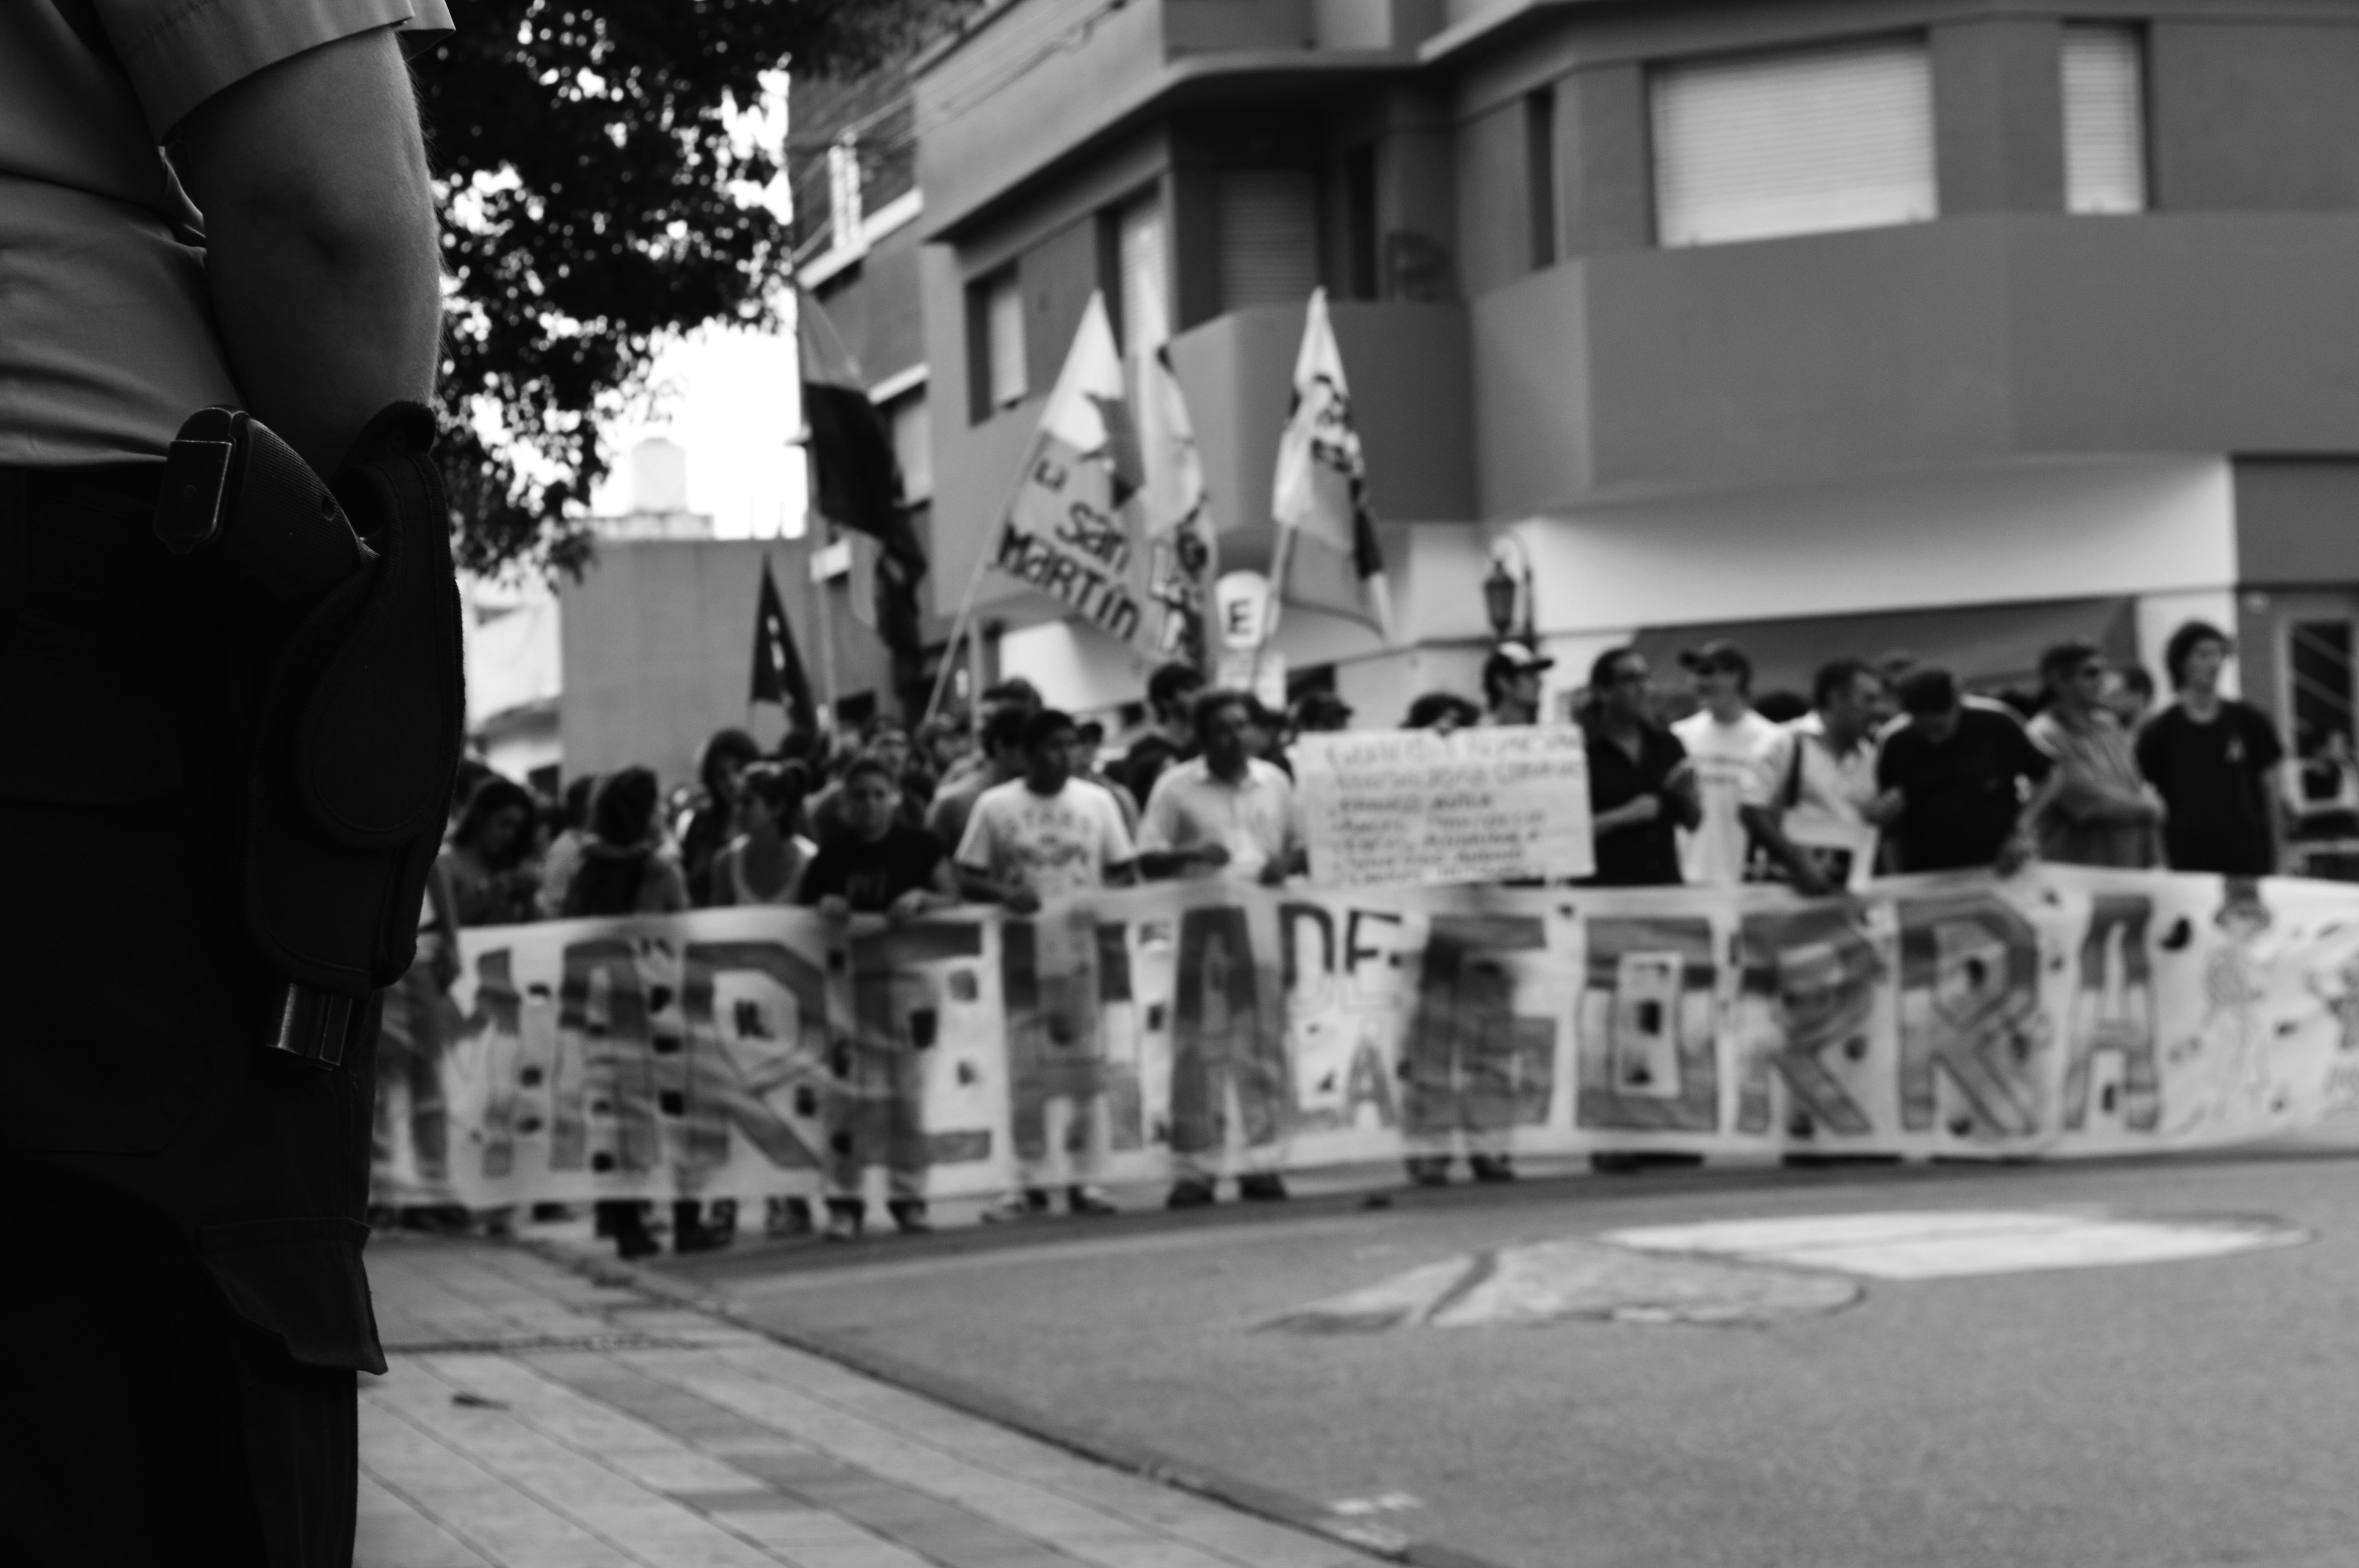 File:Marcha de la gorra 2014 en Río Cuarto - Córdoba 03.jpg ...